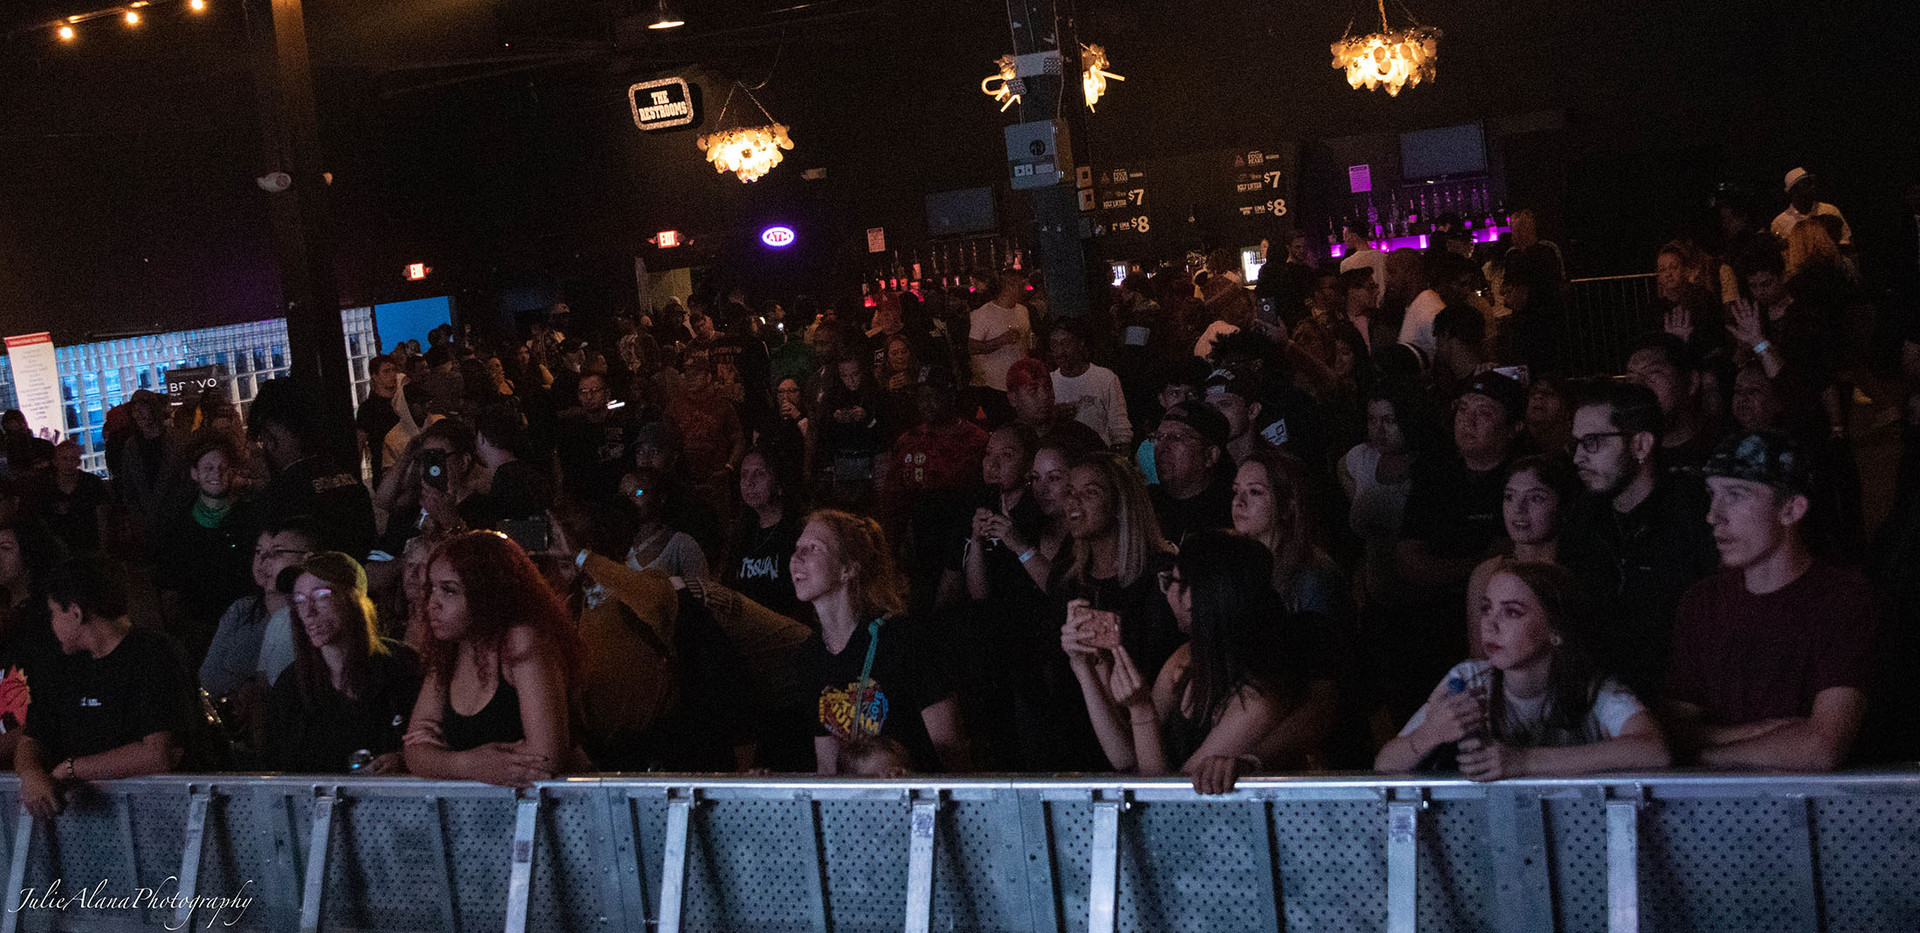 Fans of the Arizona Hip Hop Festival